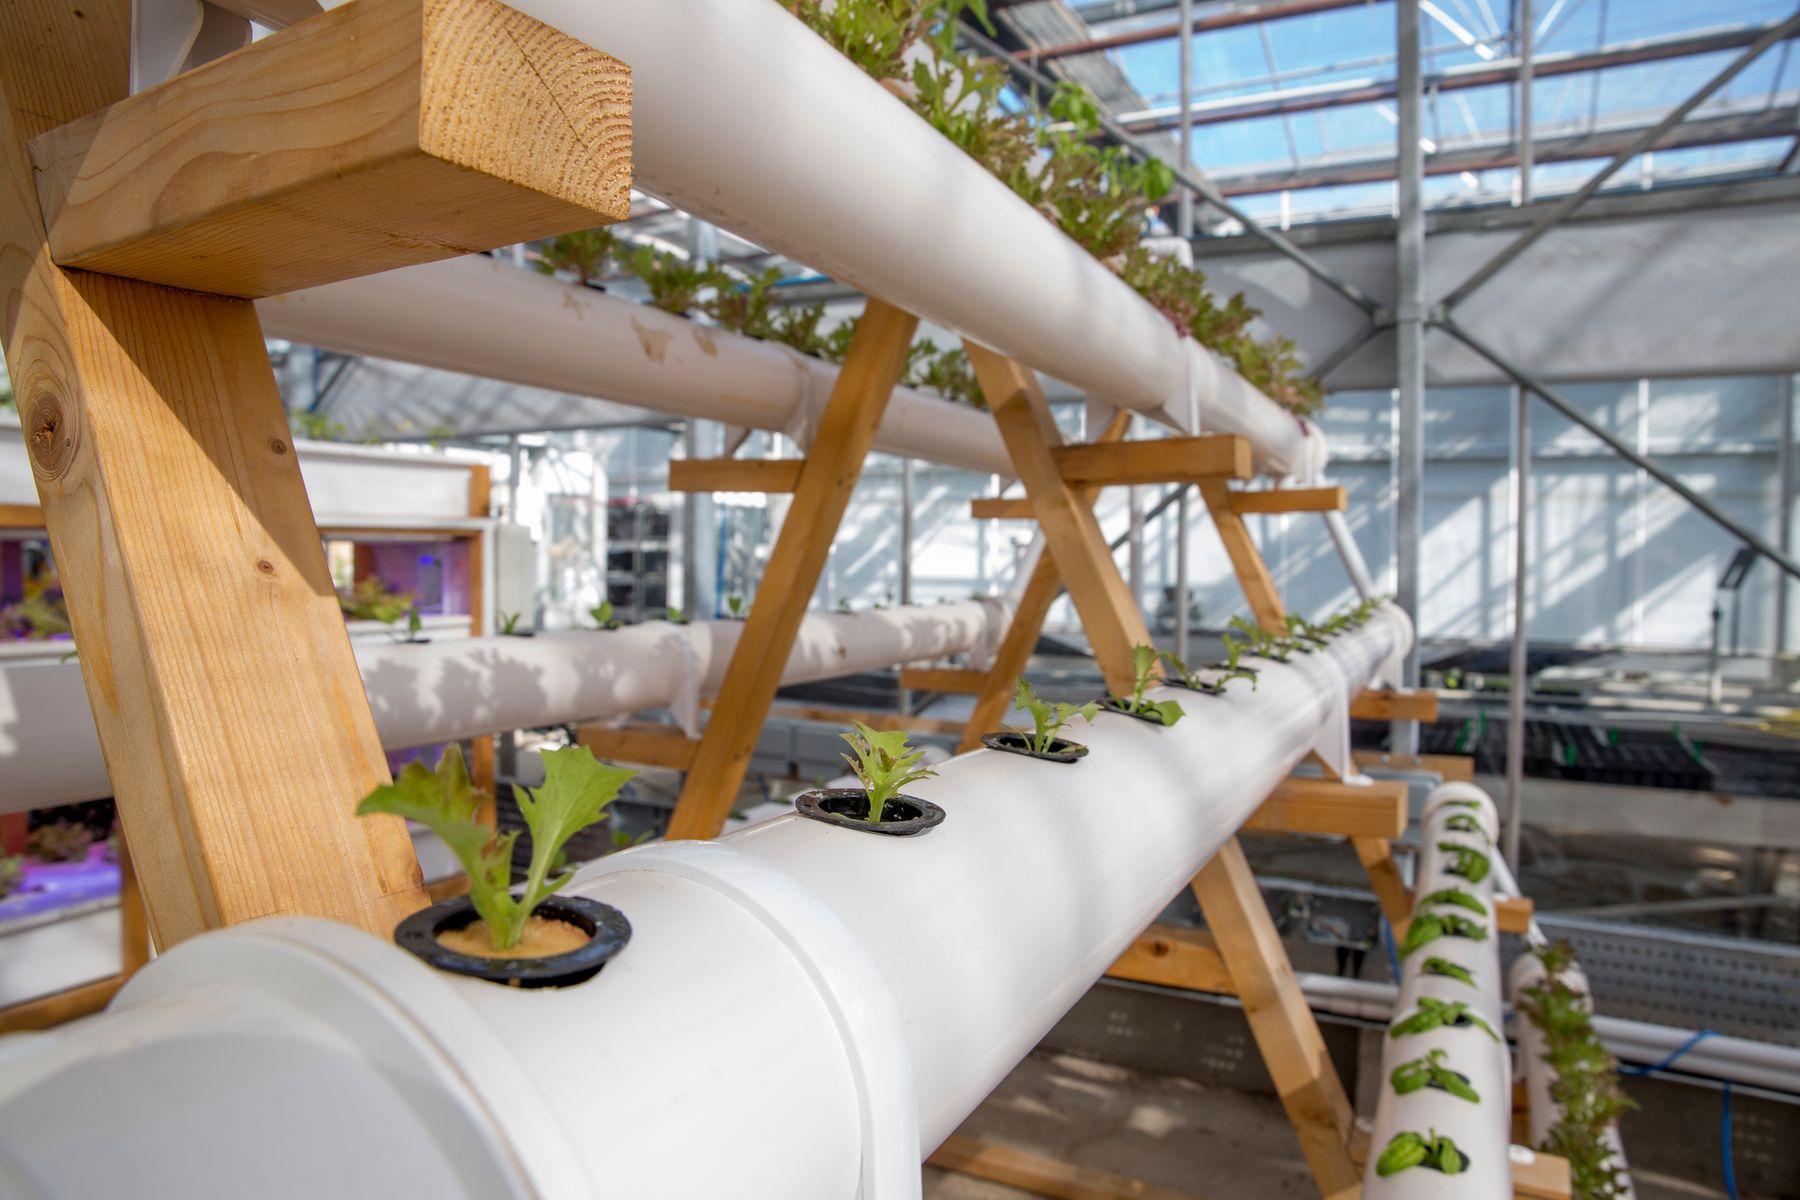 Vertical farming facilities